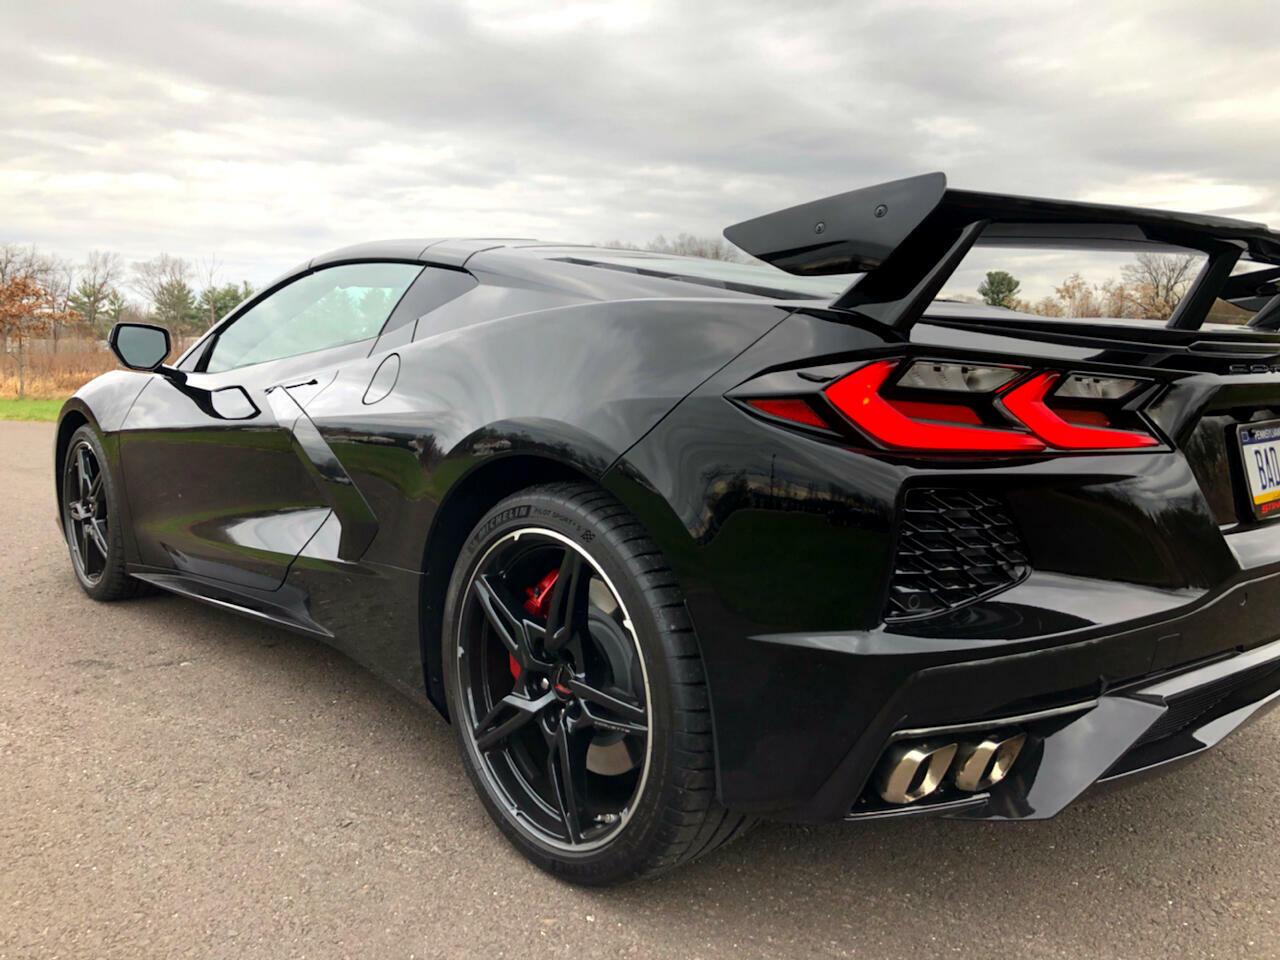 2020 Black Chevrolet Corvette Coupe 1LT | C7 Corvette Photo 8